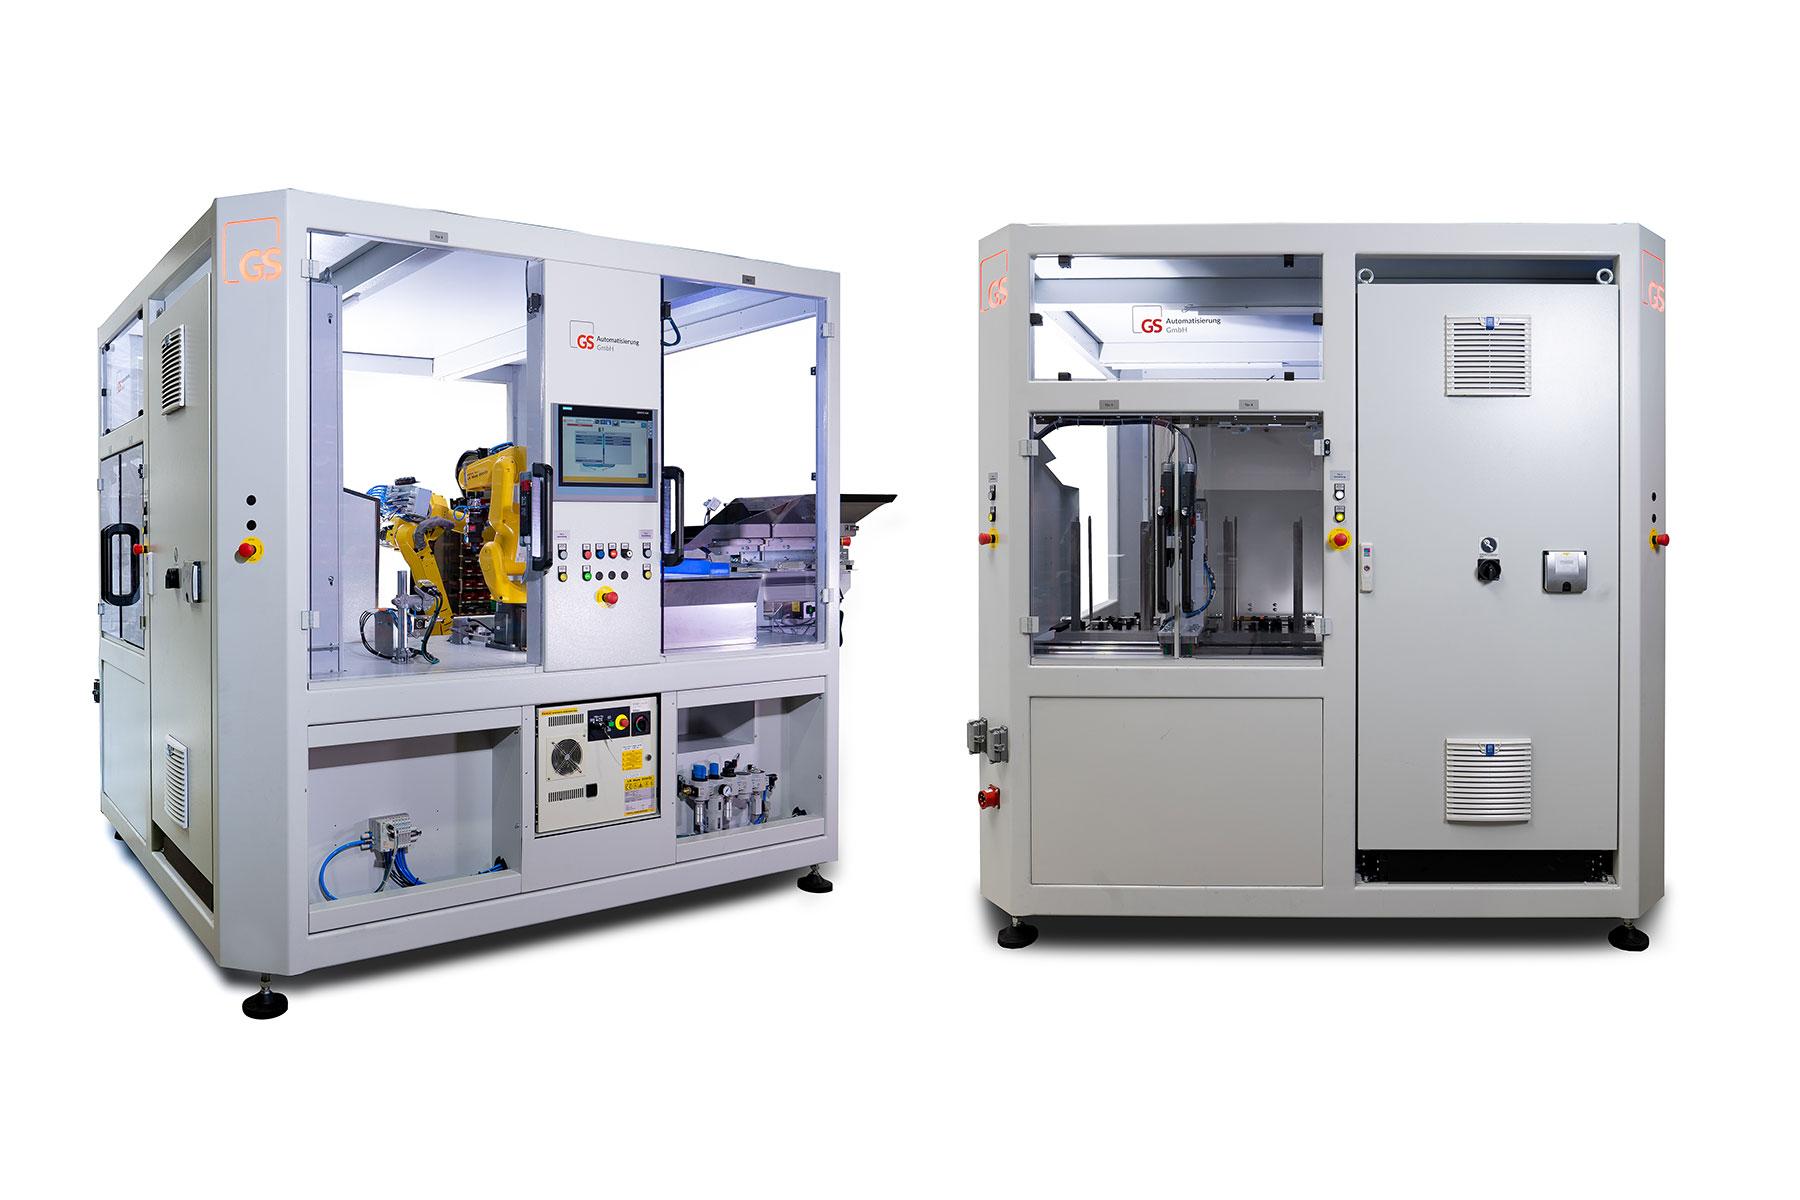 Pressenautomation | Umformtechnik